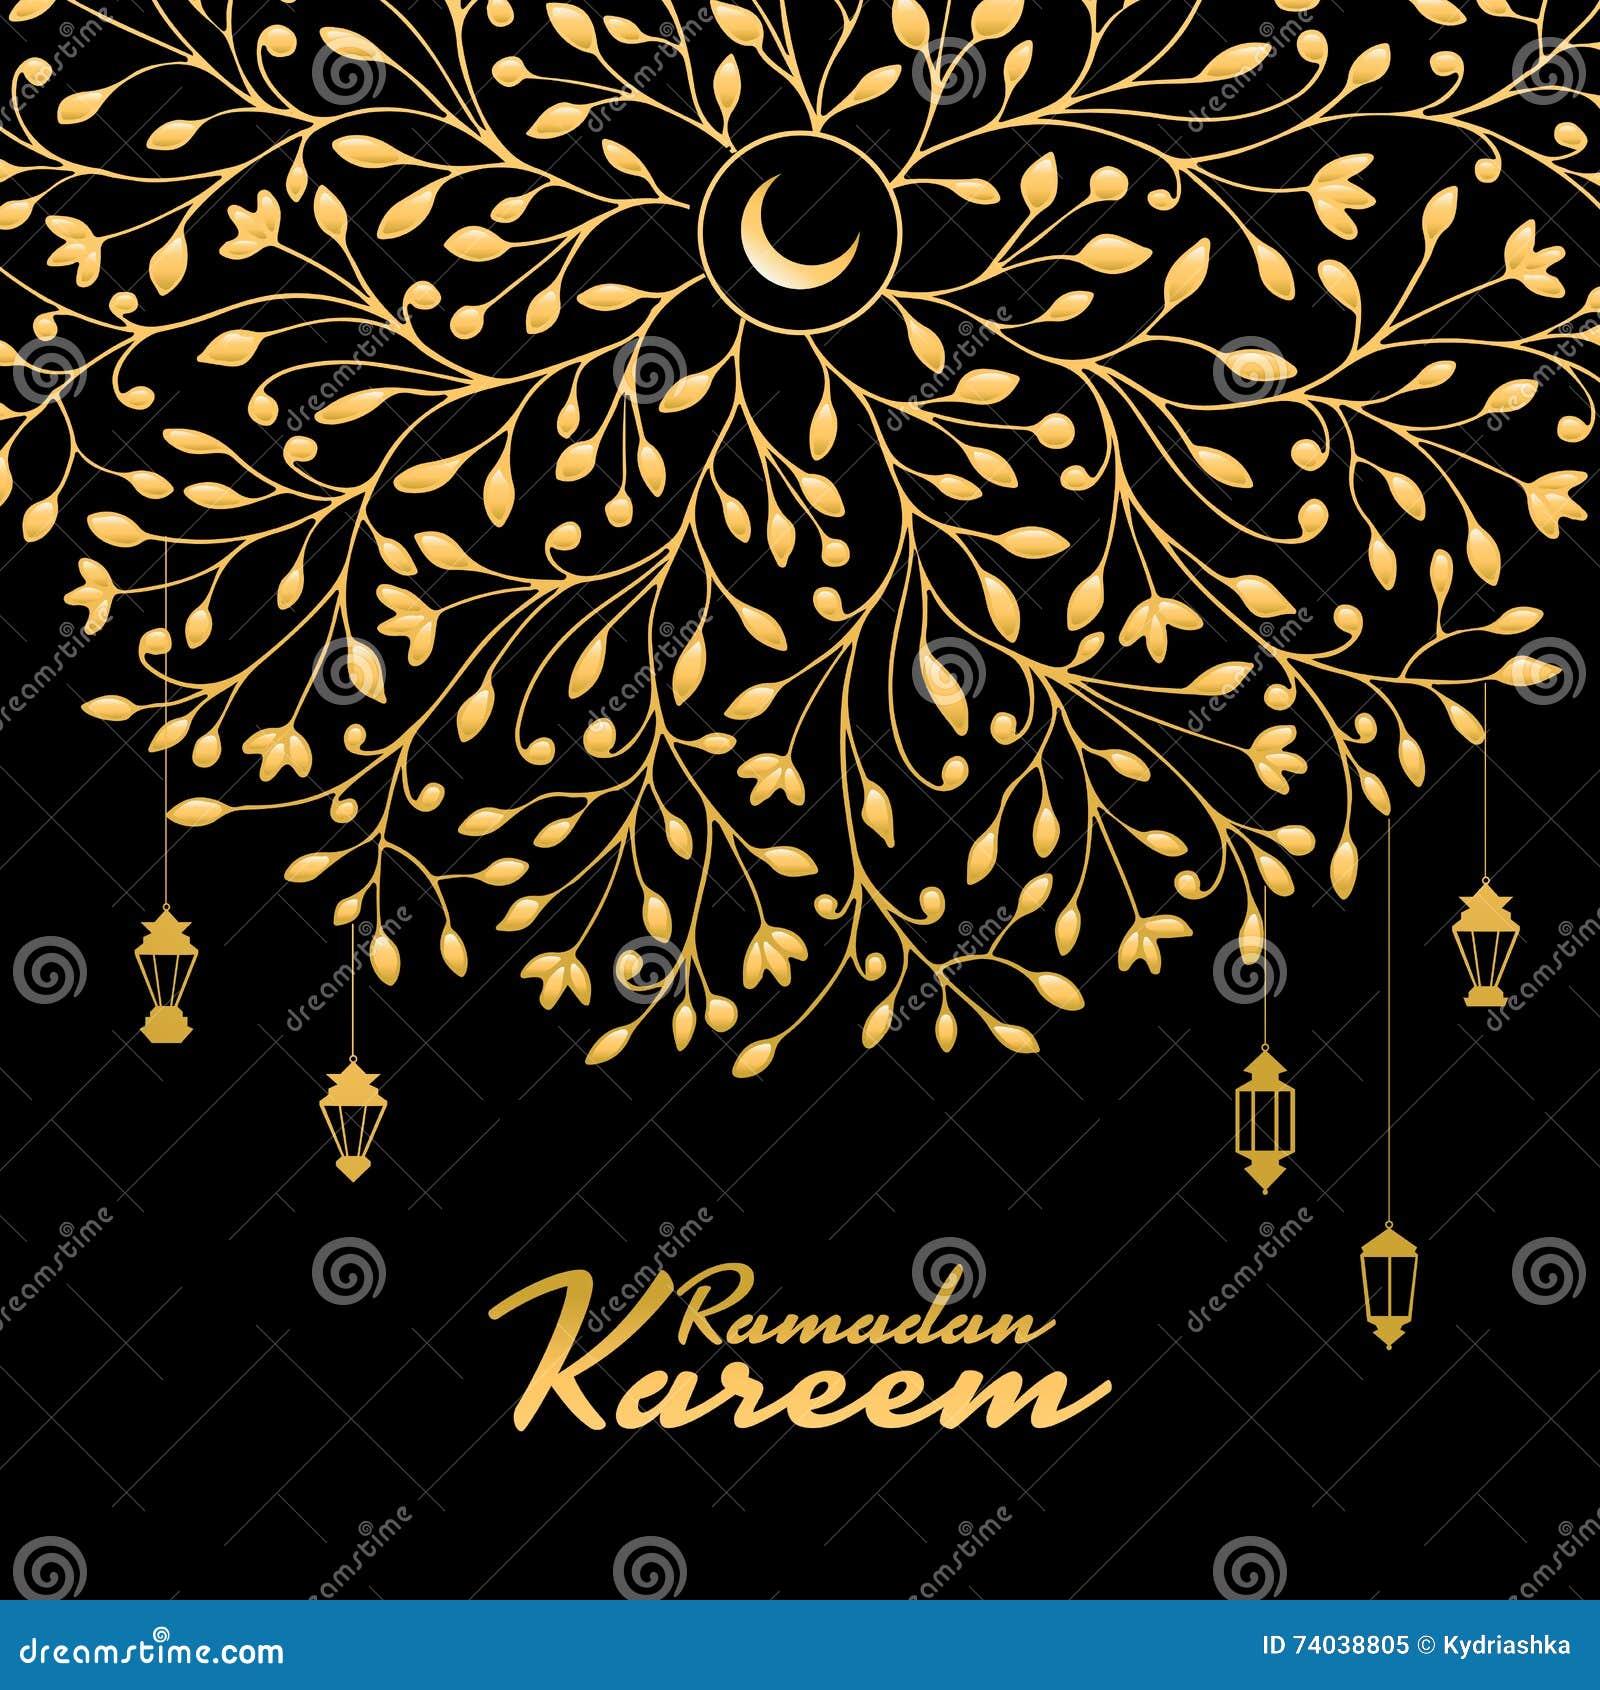 Traditional ramadan kareem month celebration greeting card design traditional ramadan kareem month celebration greeting card design m4hsunfo